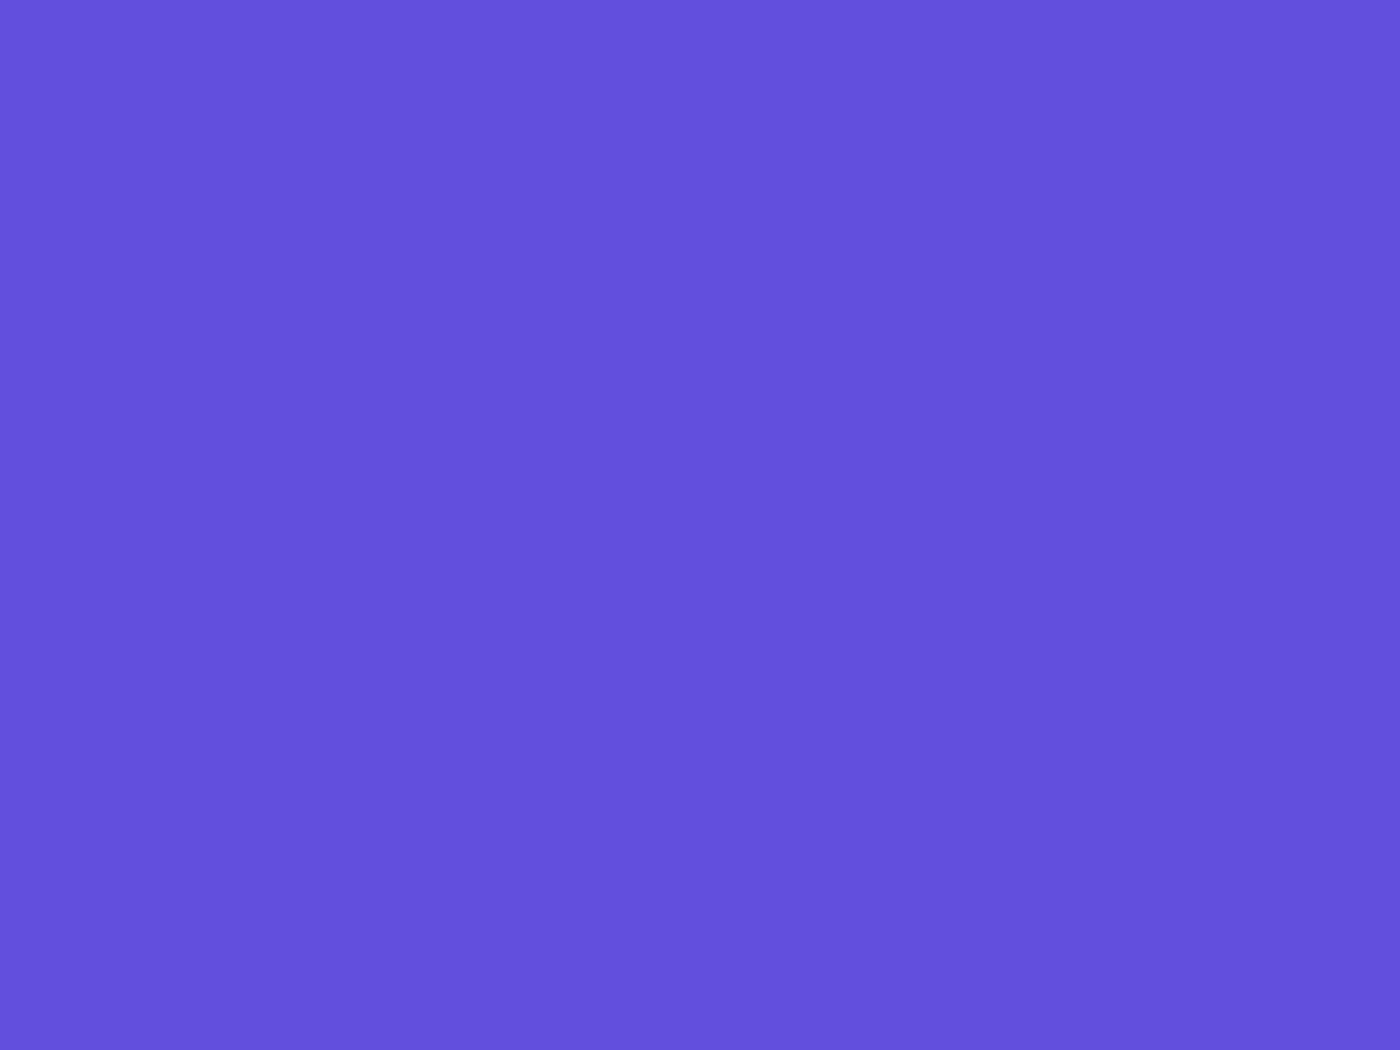 1400x1050 Majorelle Blue Solid Color Background